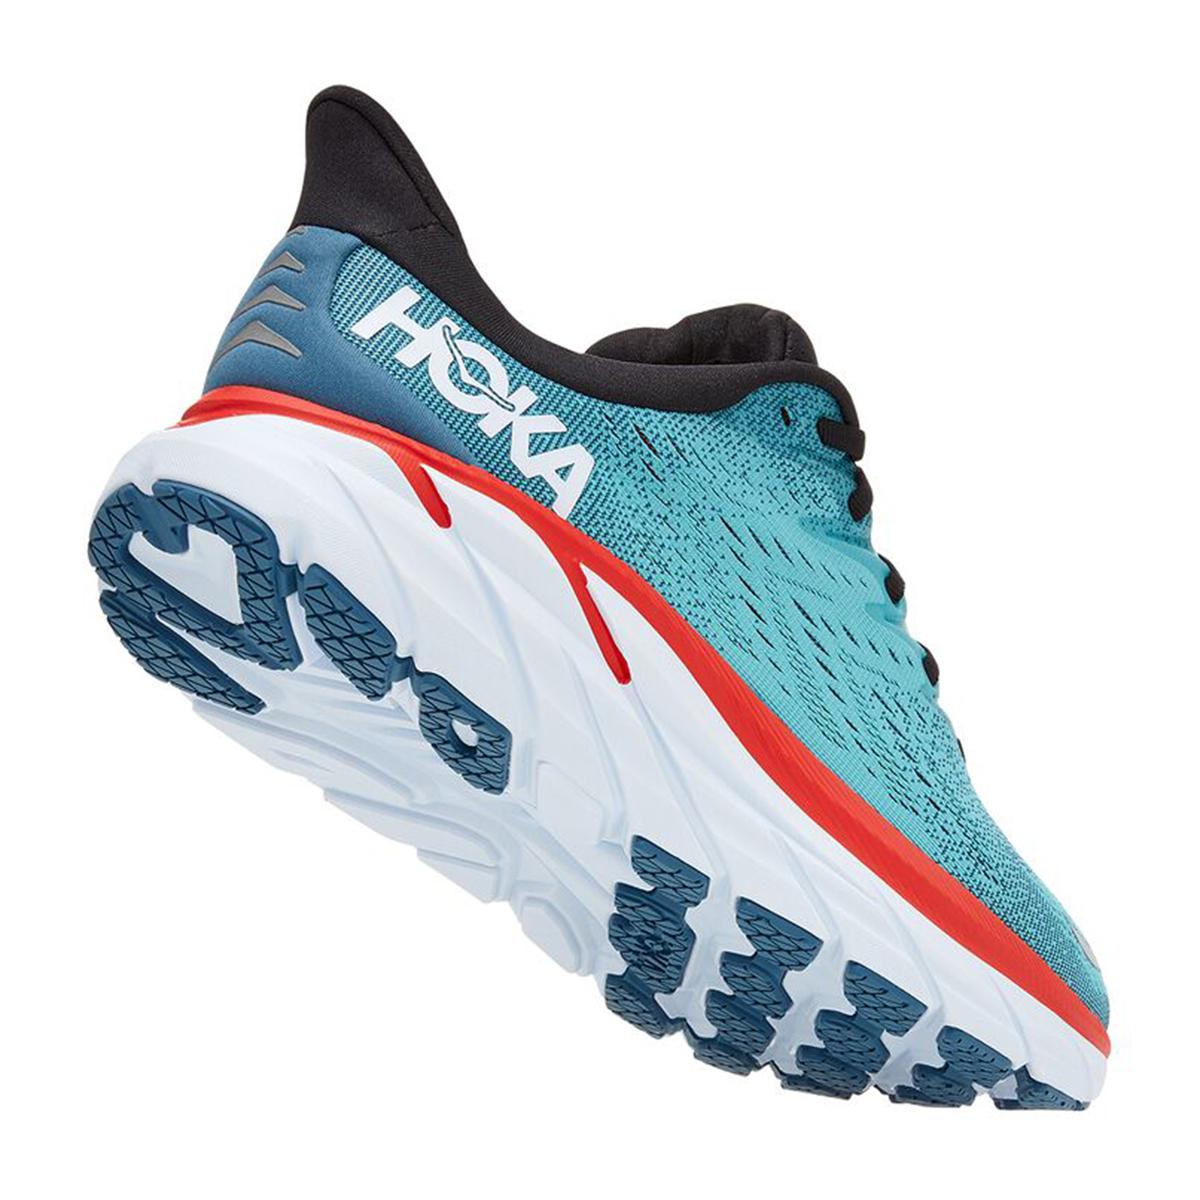 Men's Hoka One One Clifton 8 Running Shoe - Color: Real Teal/Aquarelle - Size: 7 - Width: Regular, Real Teal/Aquarelle, large, image 6